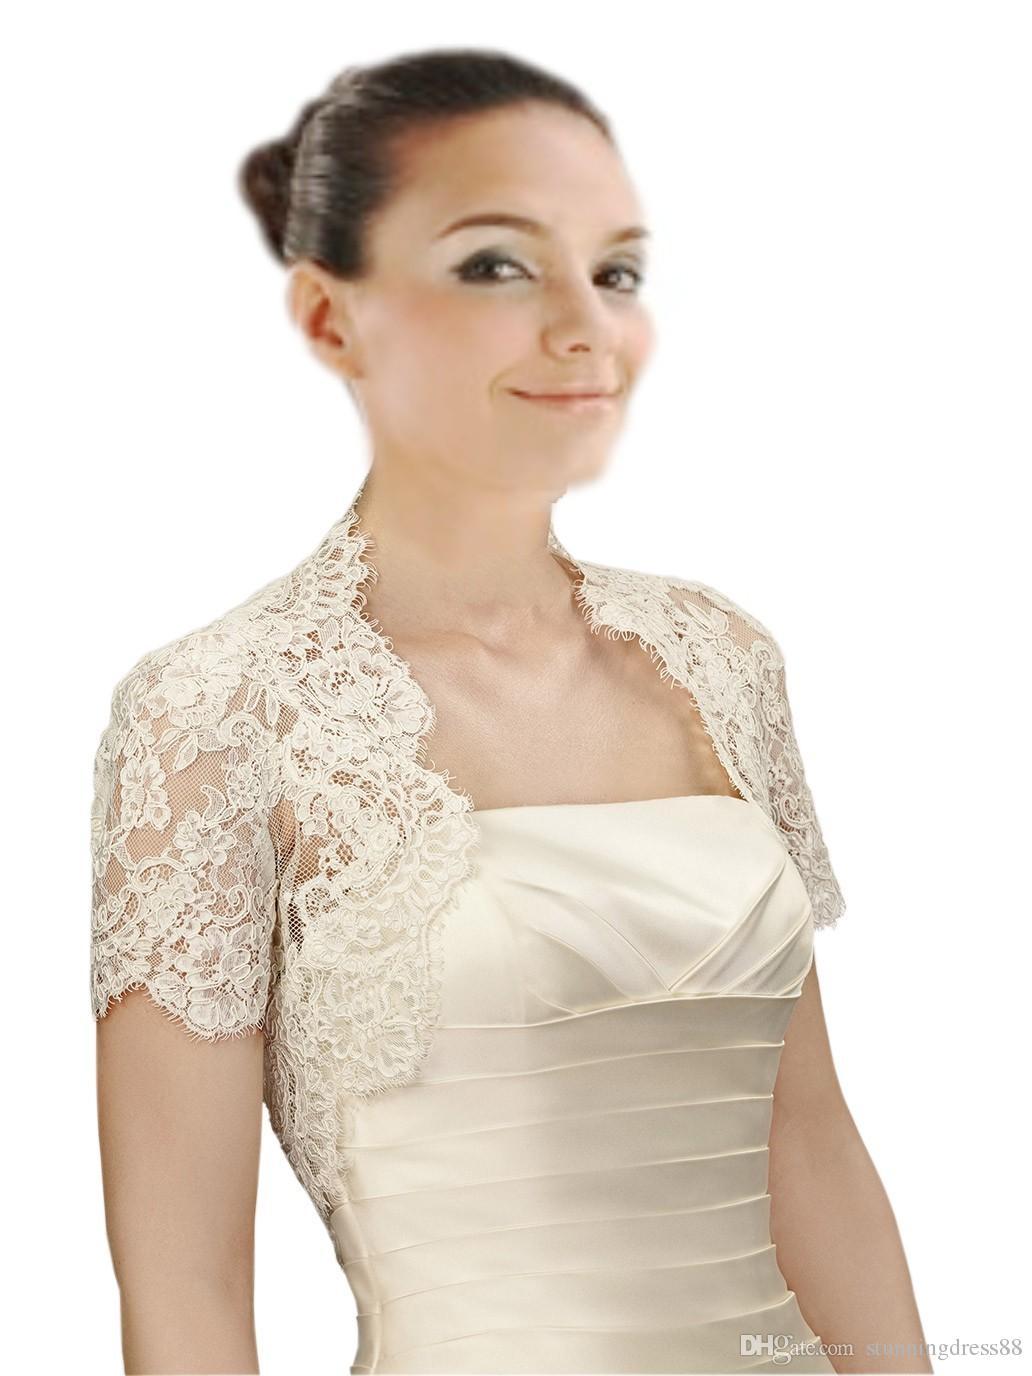 2020 Chic Short Sleeves Wedding Bridal Jackets Bolero White Ivory High Quality Free Shipping Wedding Wrap For Wedding Dress Gowns Plus size